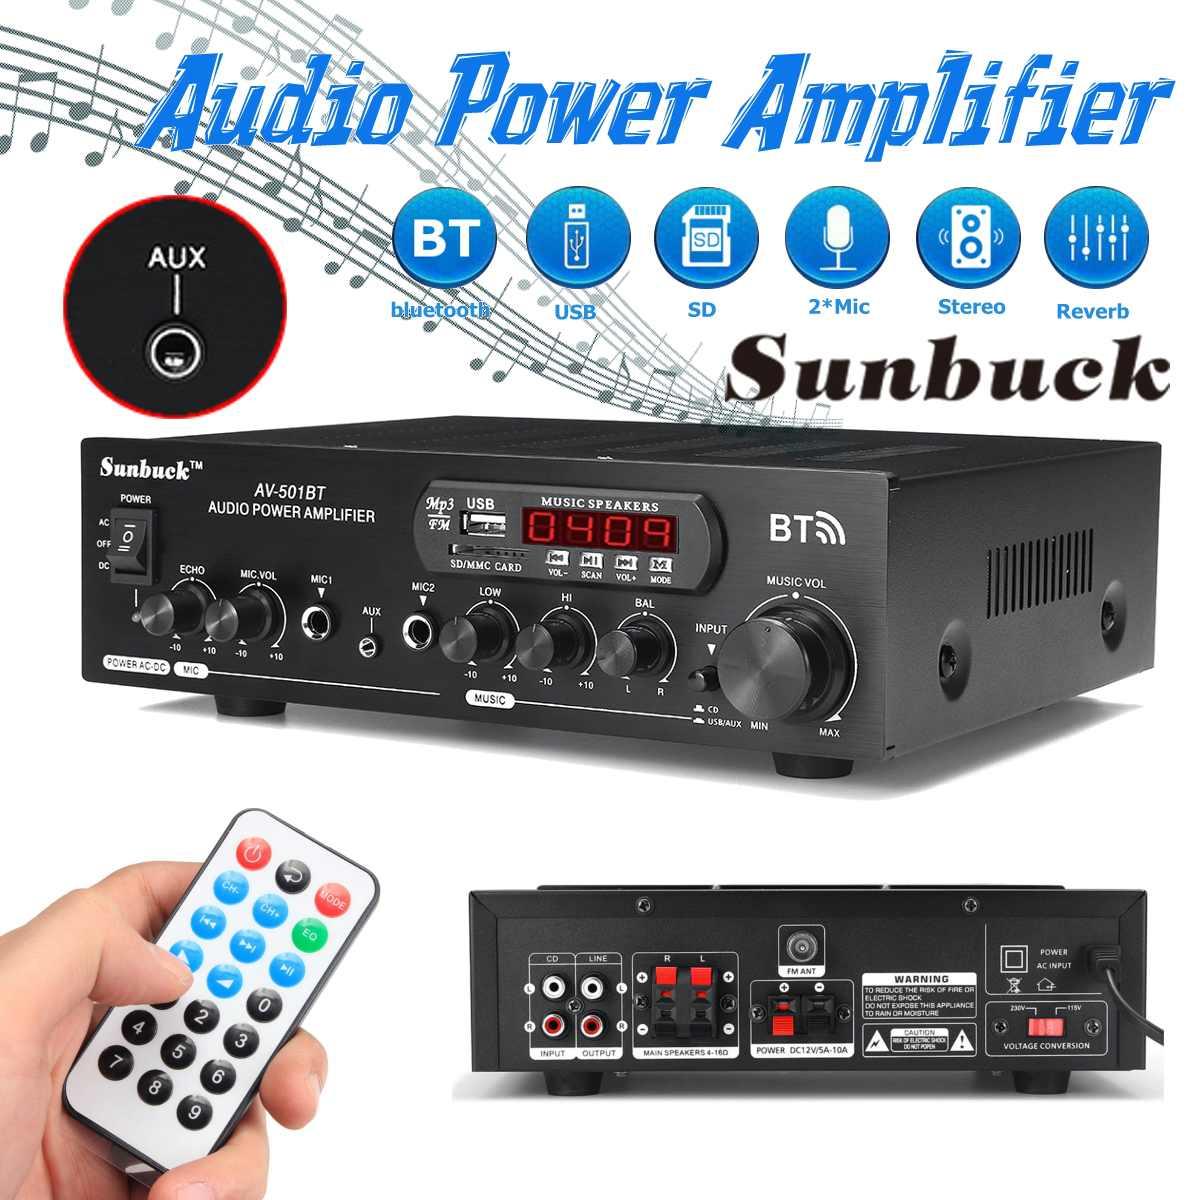 1200W 12V/110V-220V Home Car Bluetooth Power Amplifier With Remote Control HiFi Stereo Digital AMP 2x Mic AUX USB SD Card Input